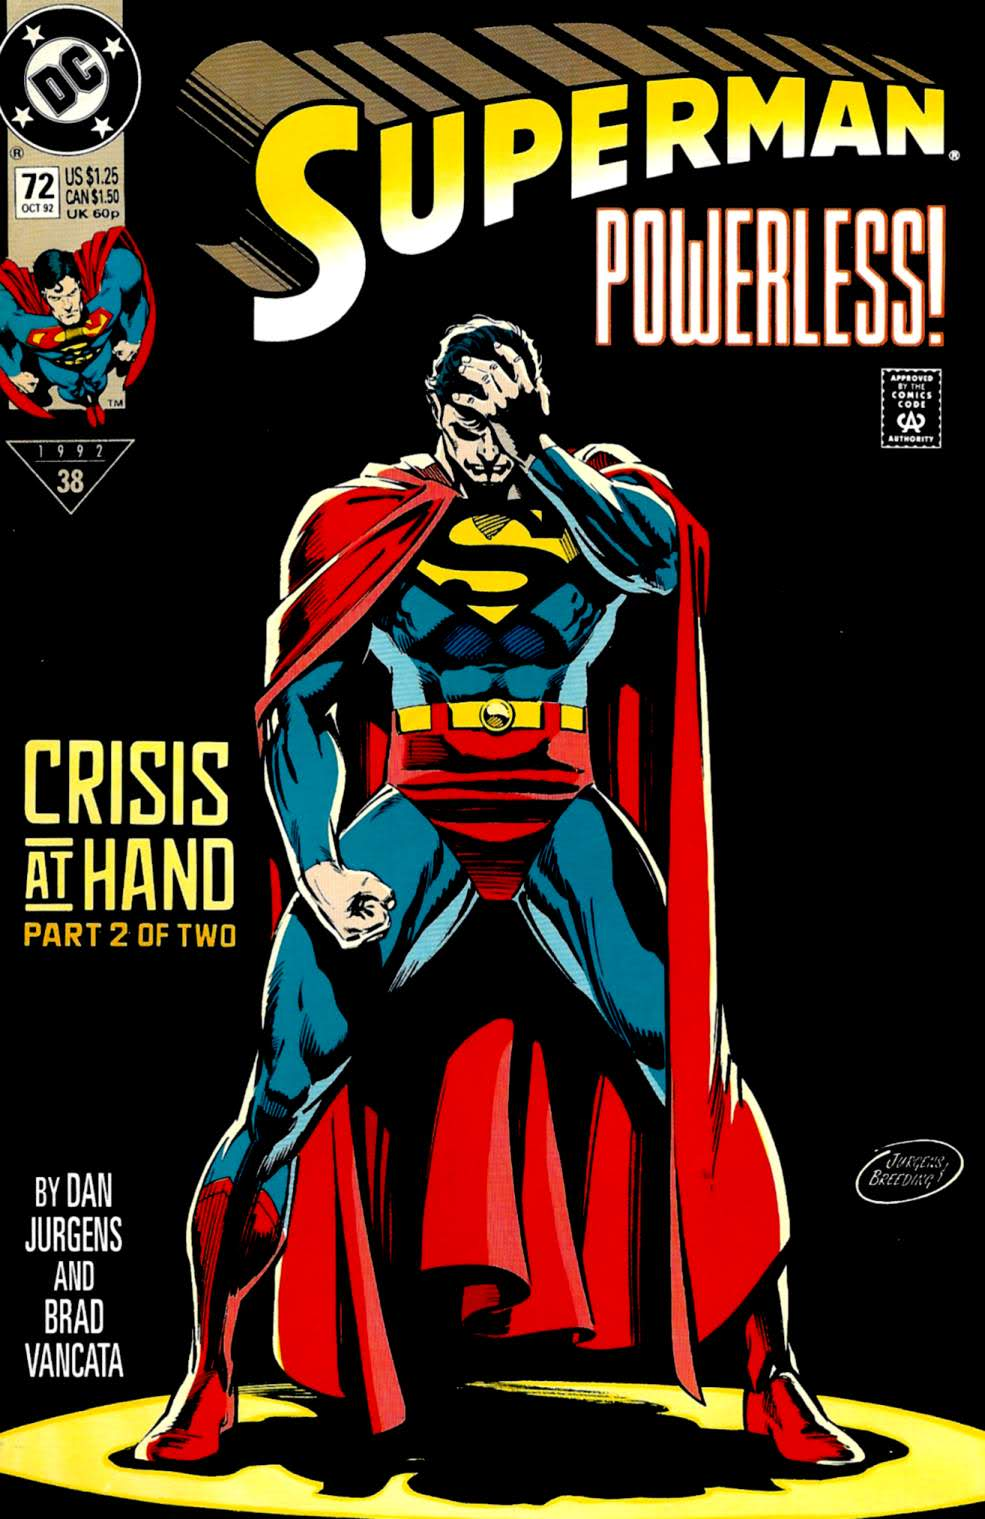 Cover art to  Superman (vol. 2) #72, by Dan Jurgens and Brett Breeding.